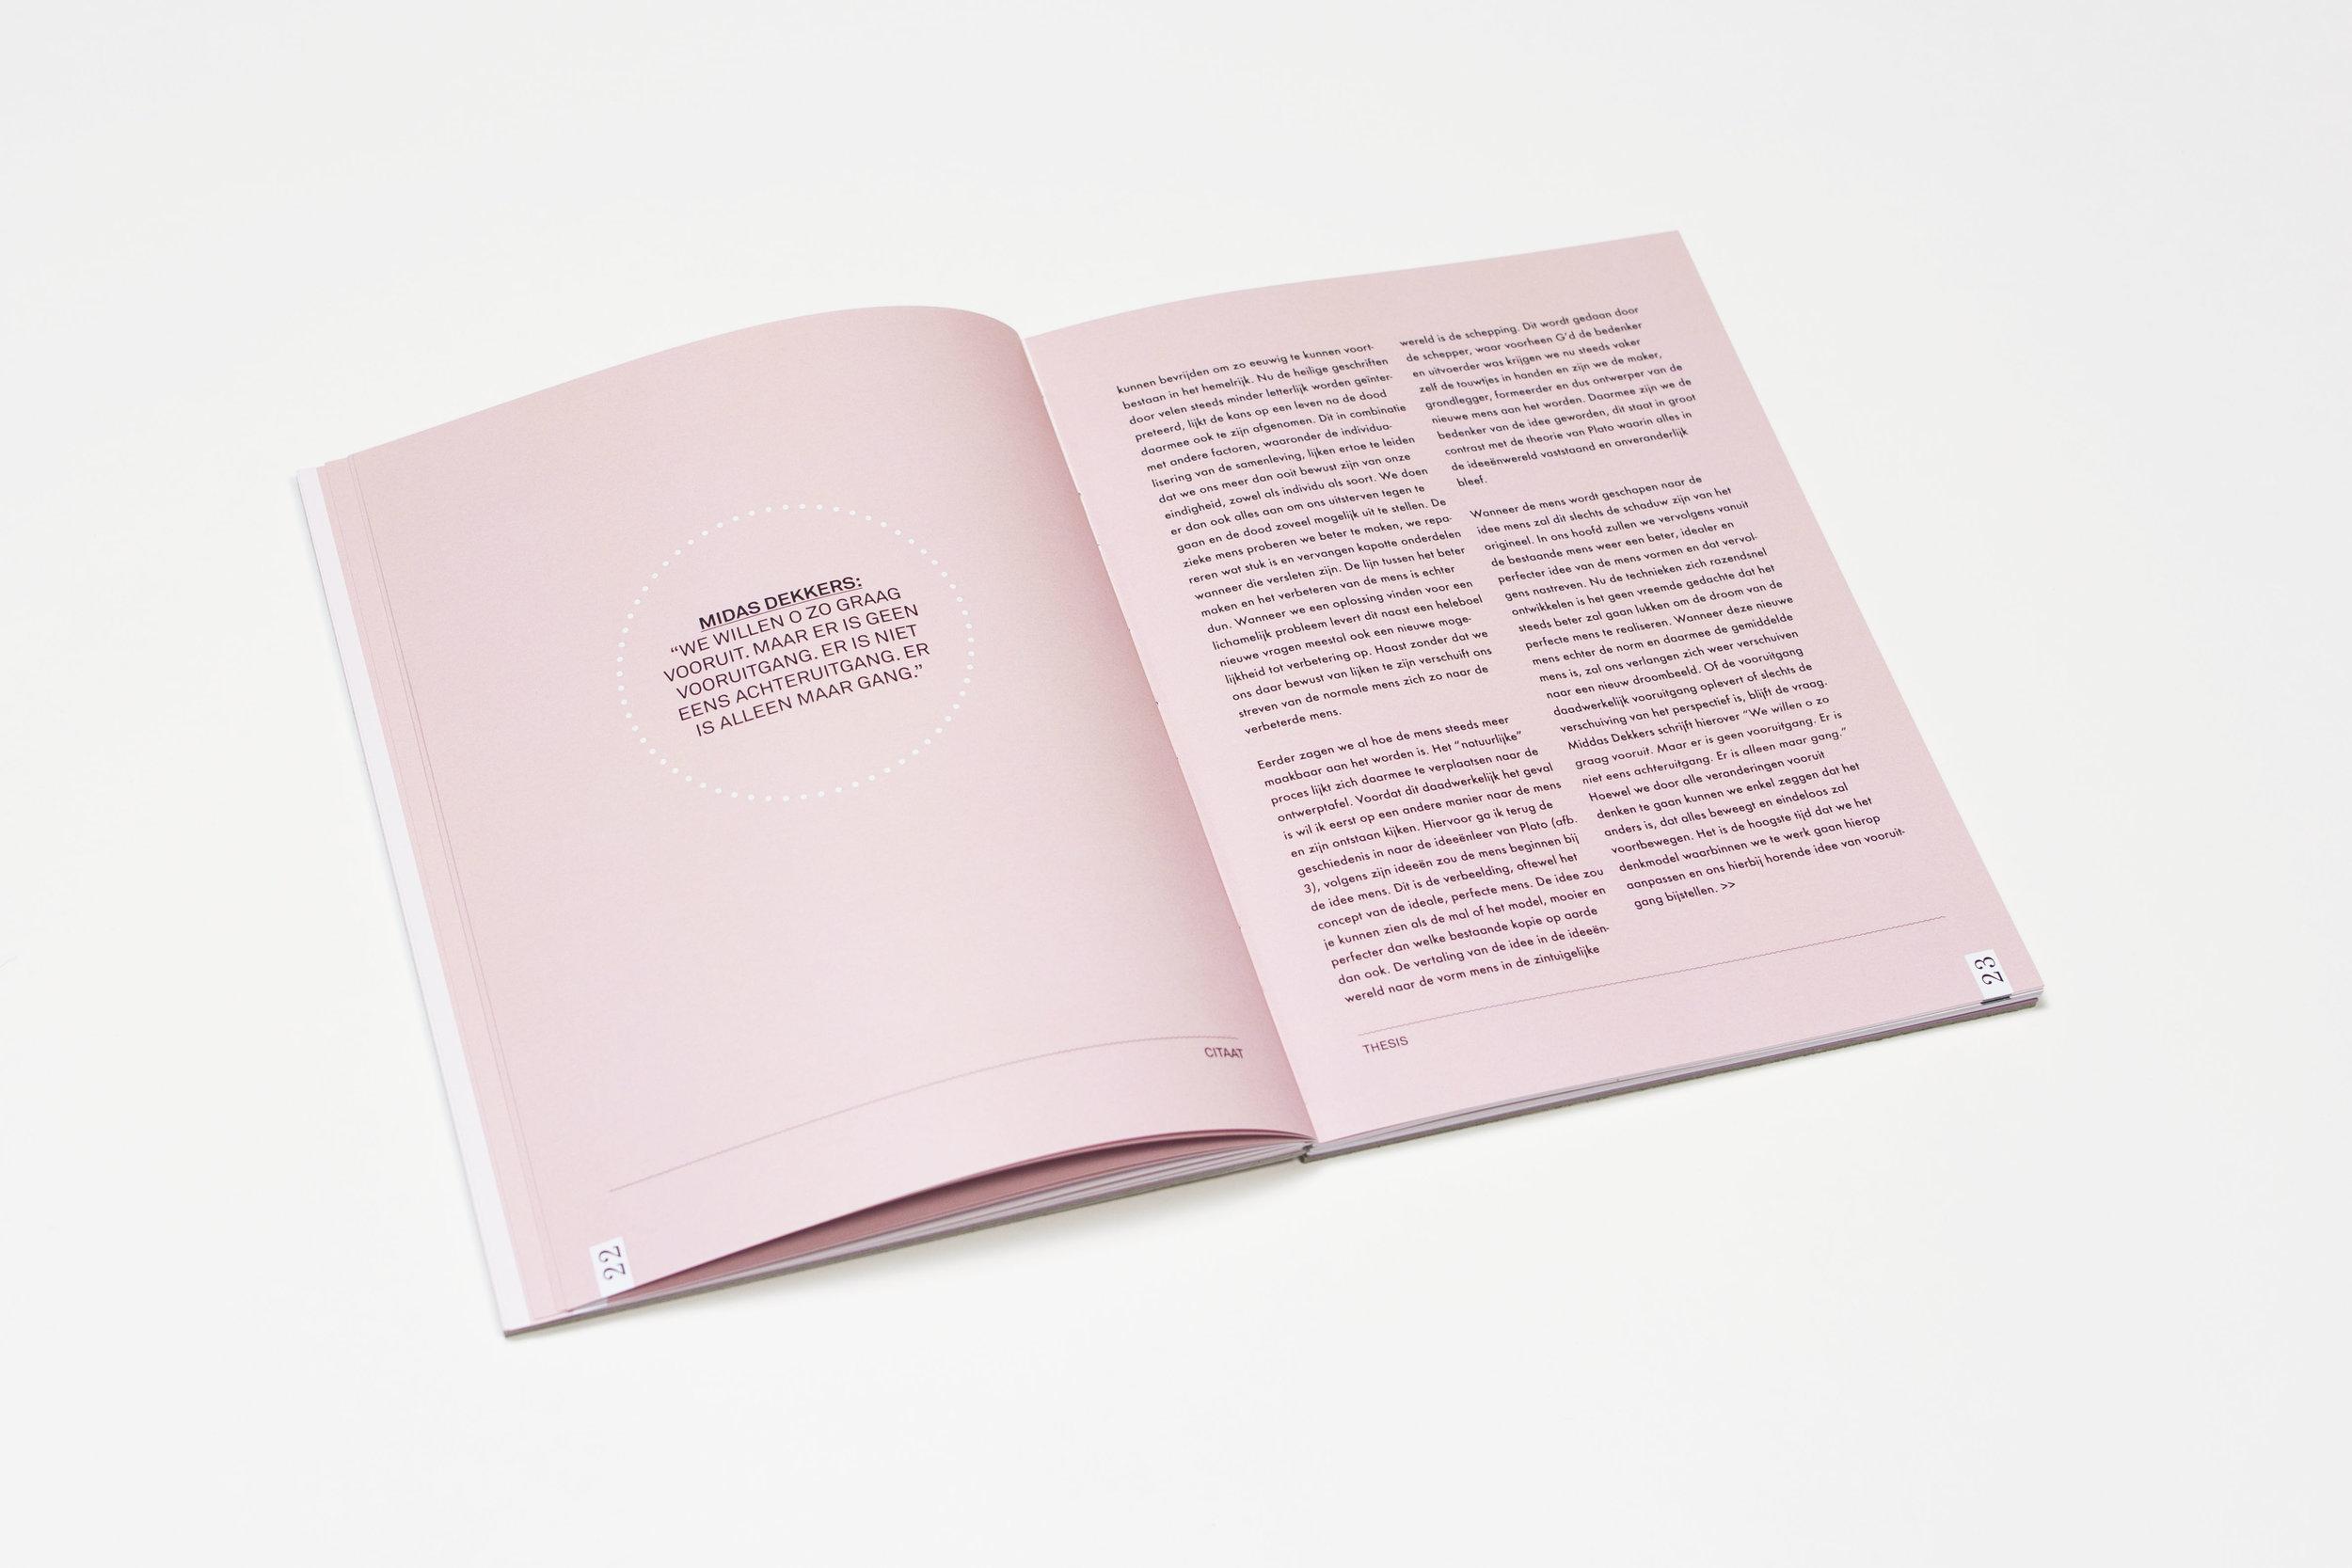 Reborn_Thesis_Book_012.jpg